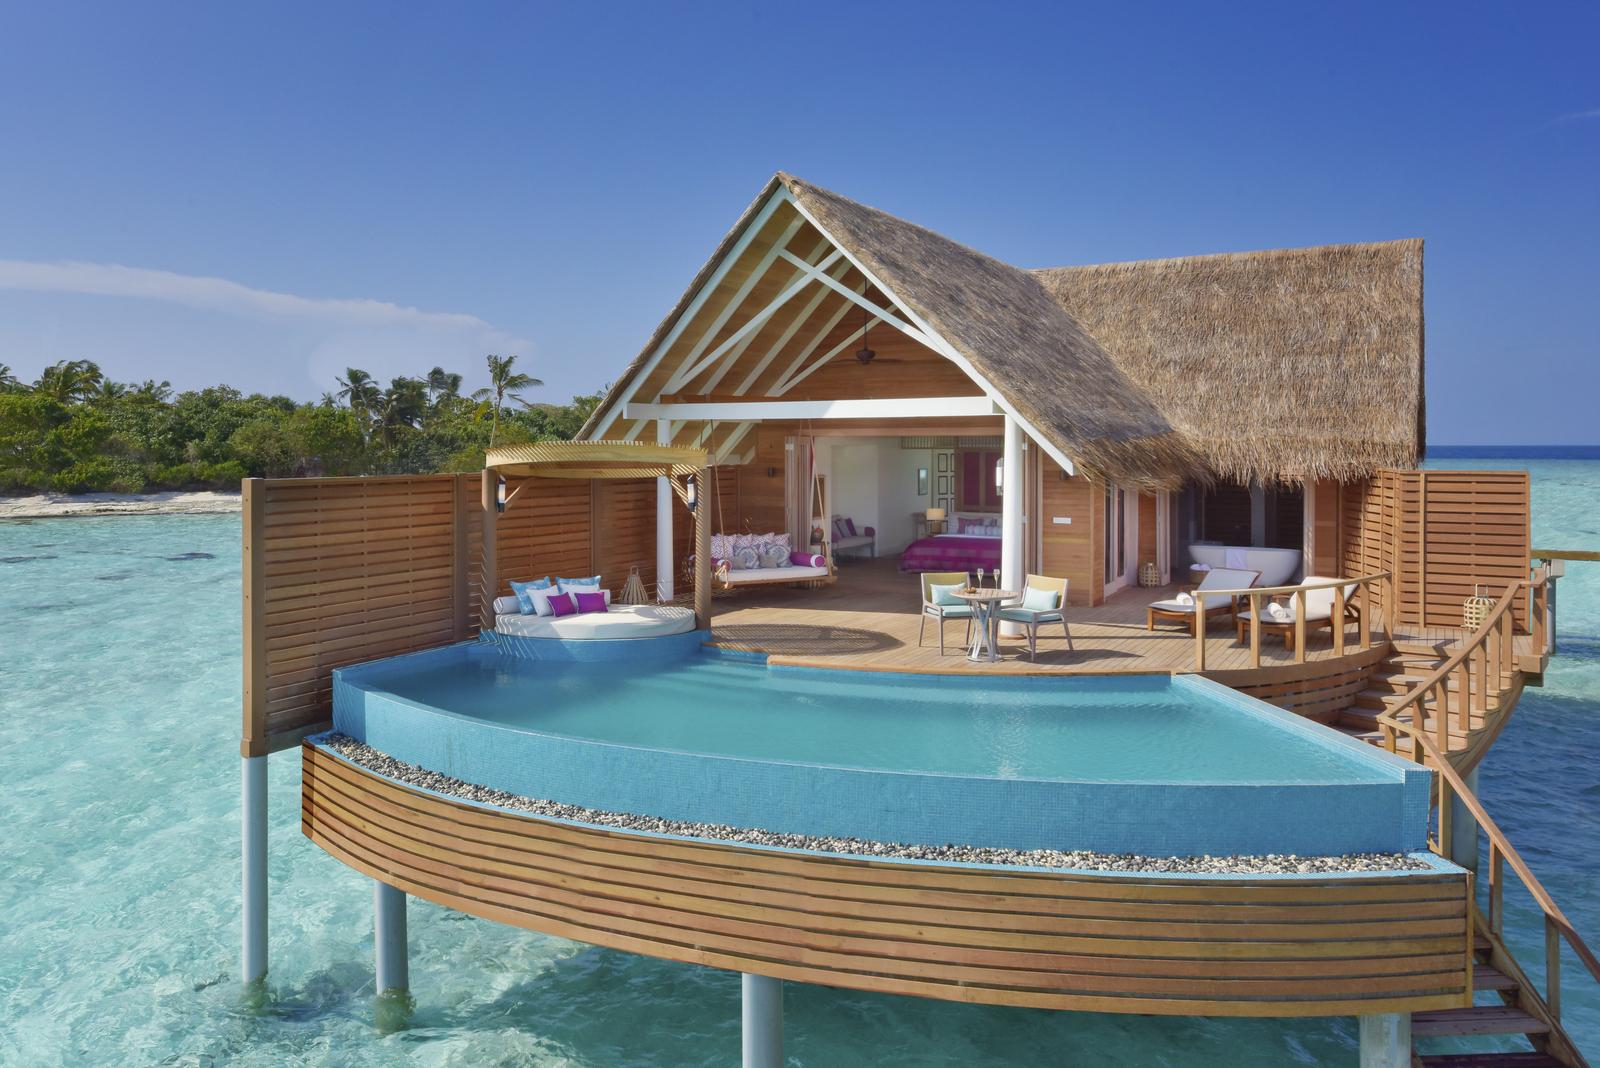 Malediven    die neue Trauminsel Milaidhoo im Baa Atoll strand sonne reisebericht malediven honeymoon 2  TUI Berlin Milaidhoo Maldives Water Pool Villa 1